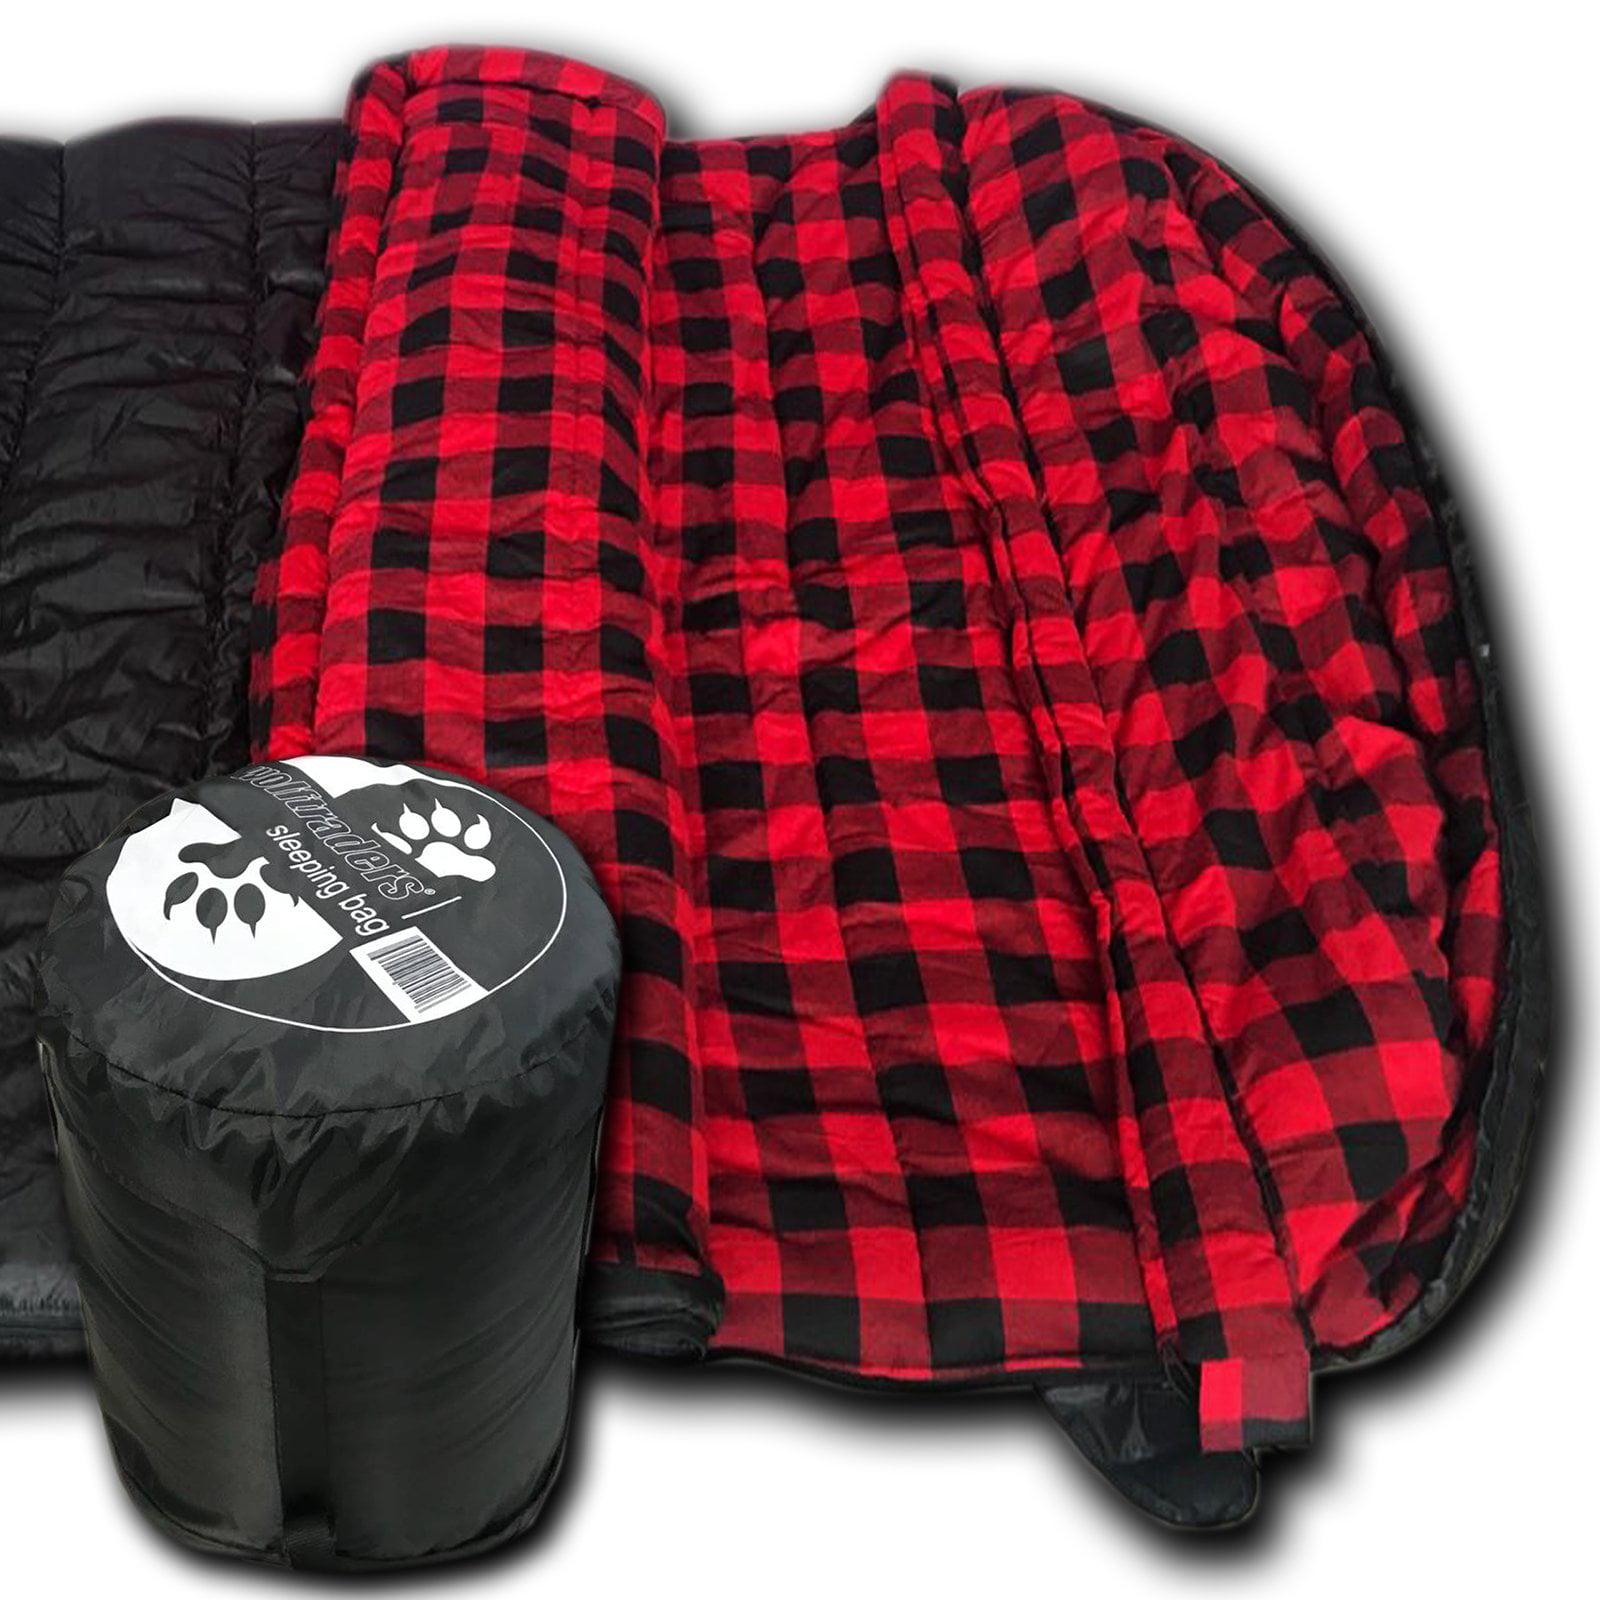 Wolftraders TwoWolves +0 Degree 2-Person Ripstop Premium Comfort Sleeping Bag, Black/Red